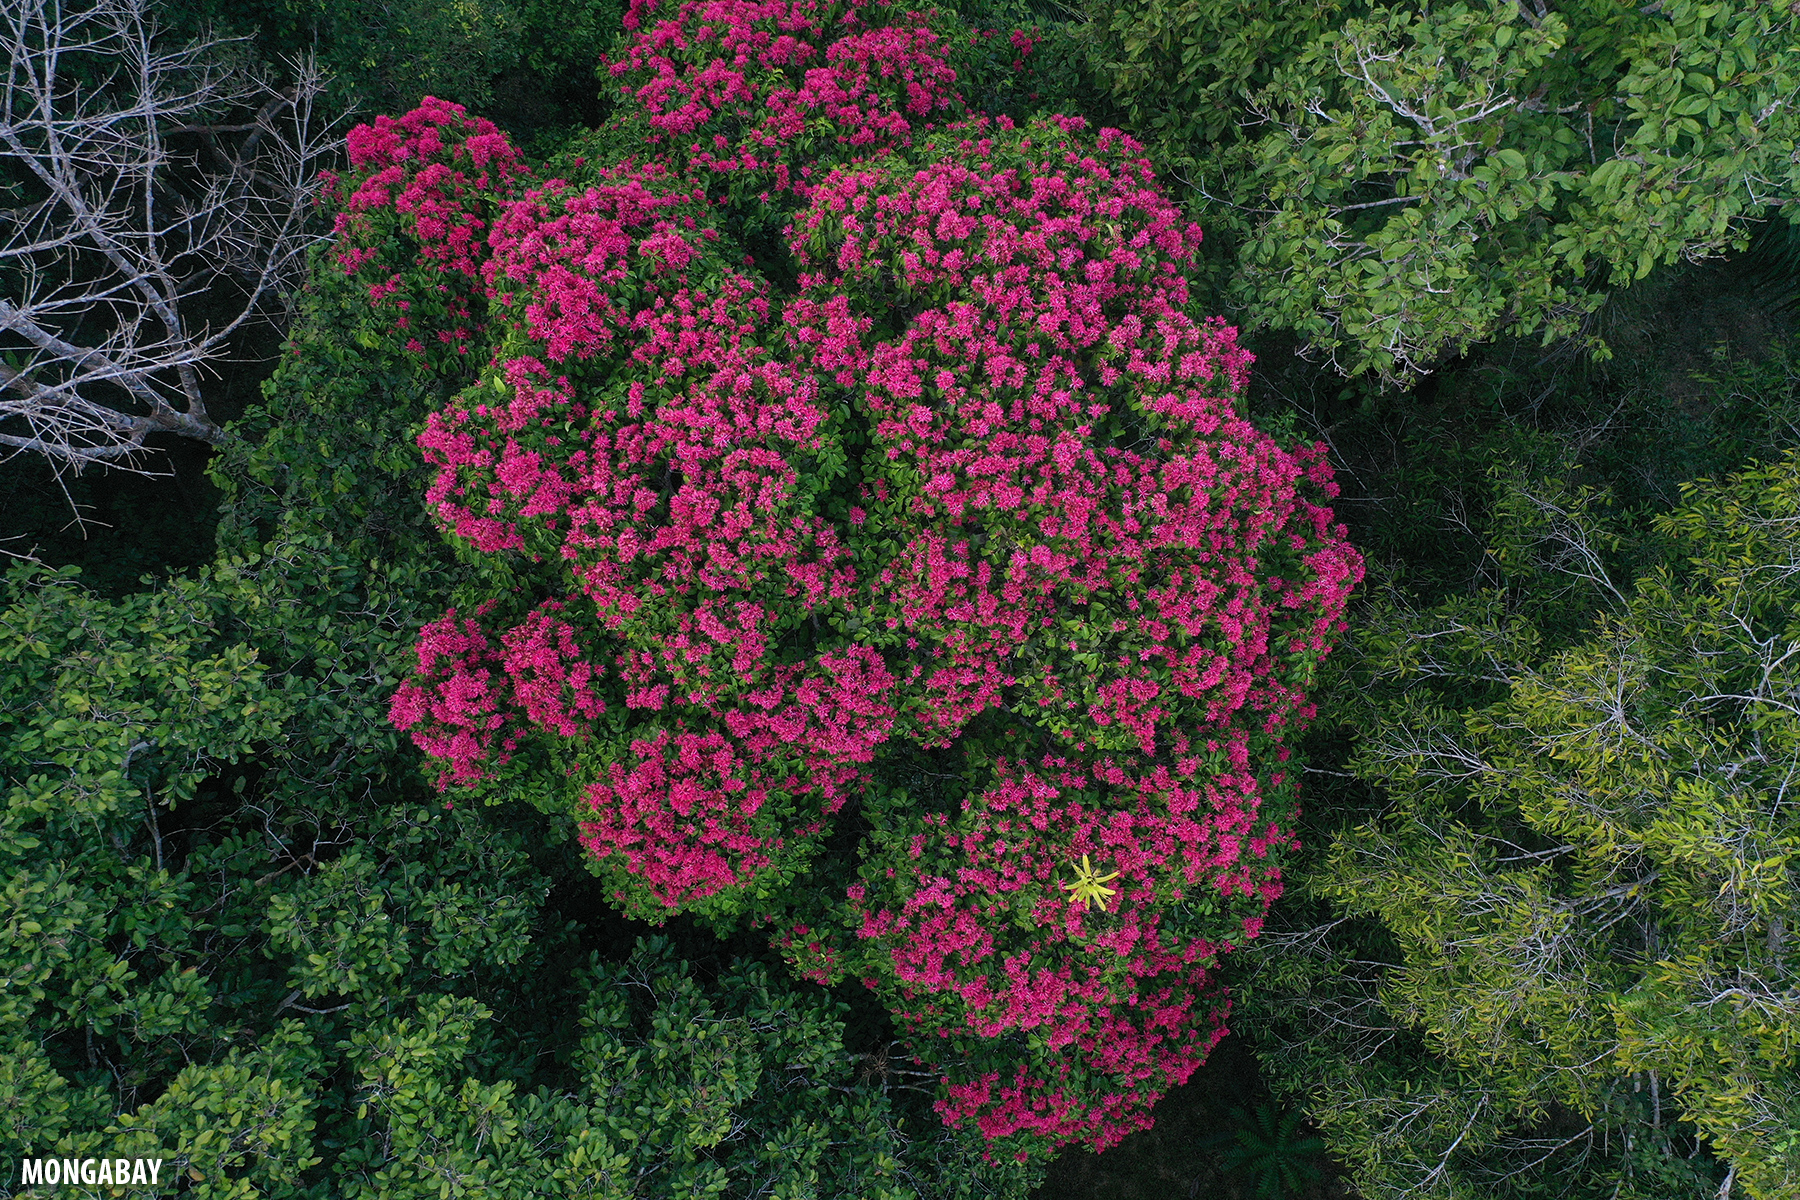 Rainforest tree with magenta flowers